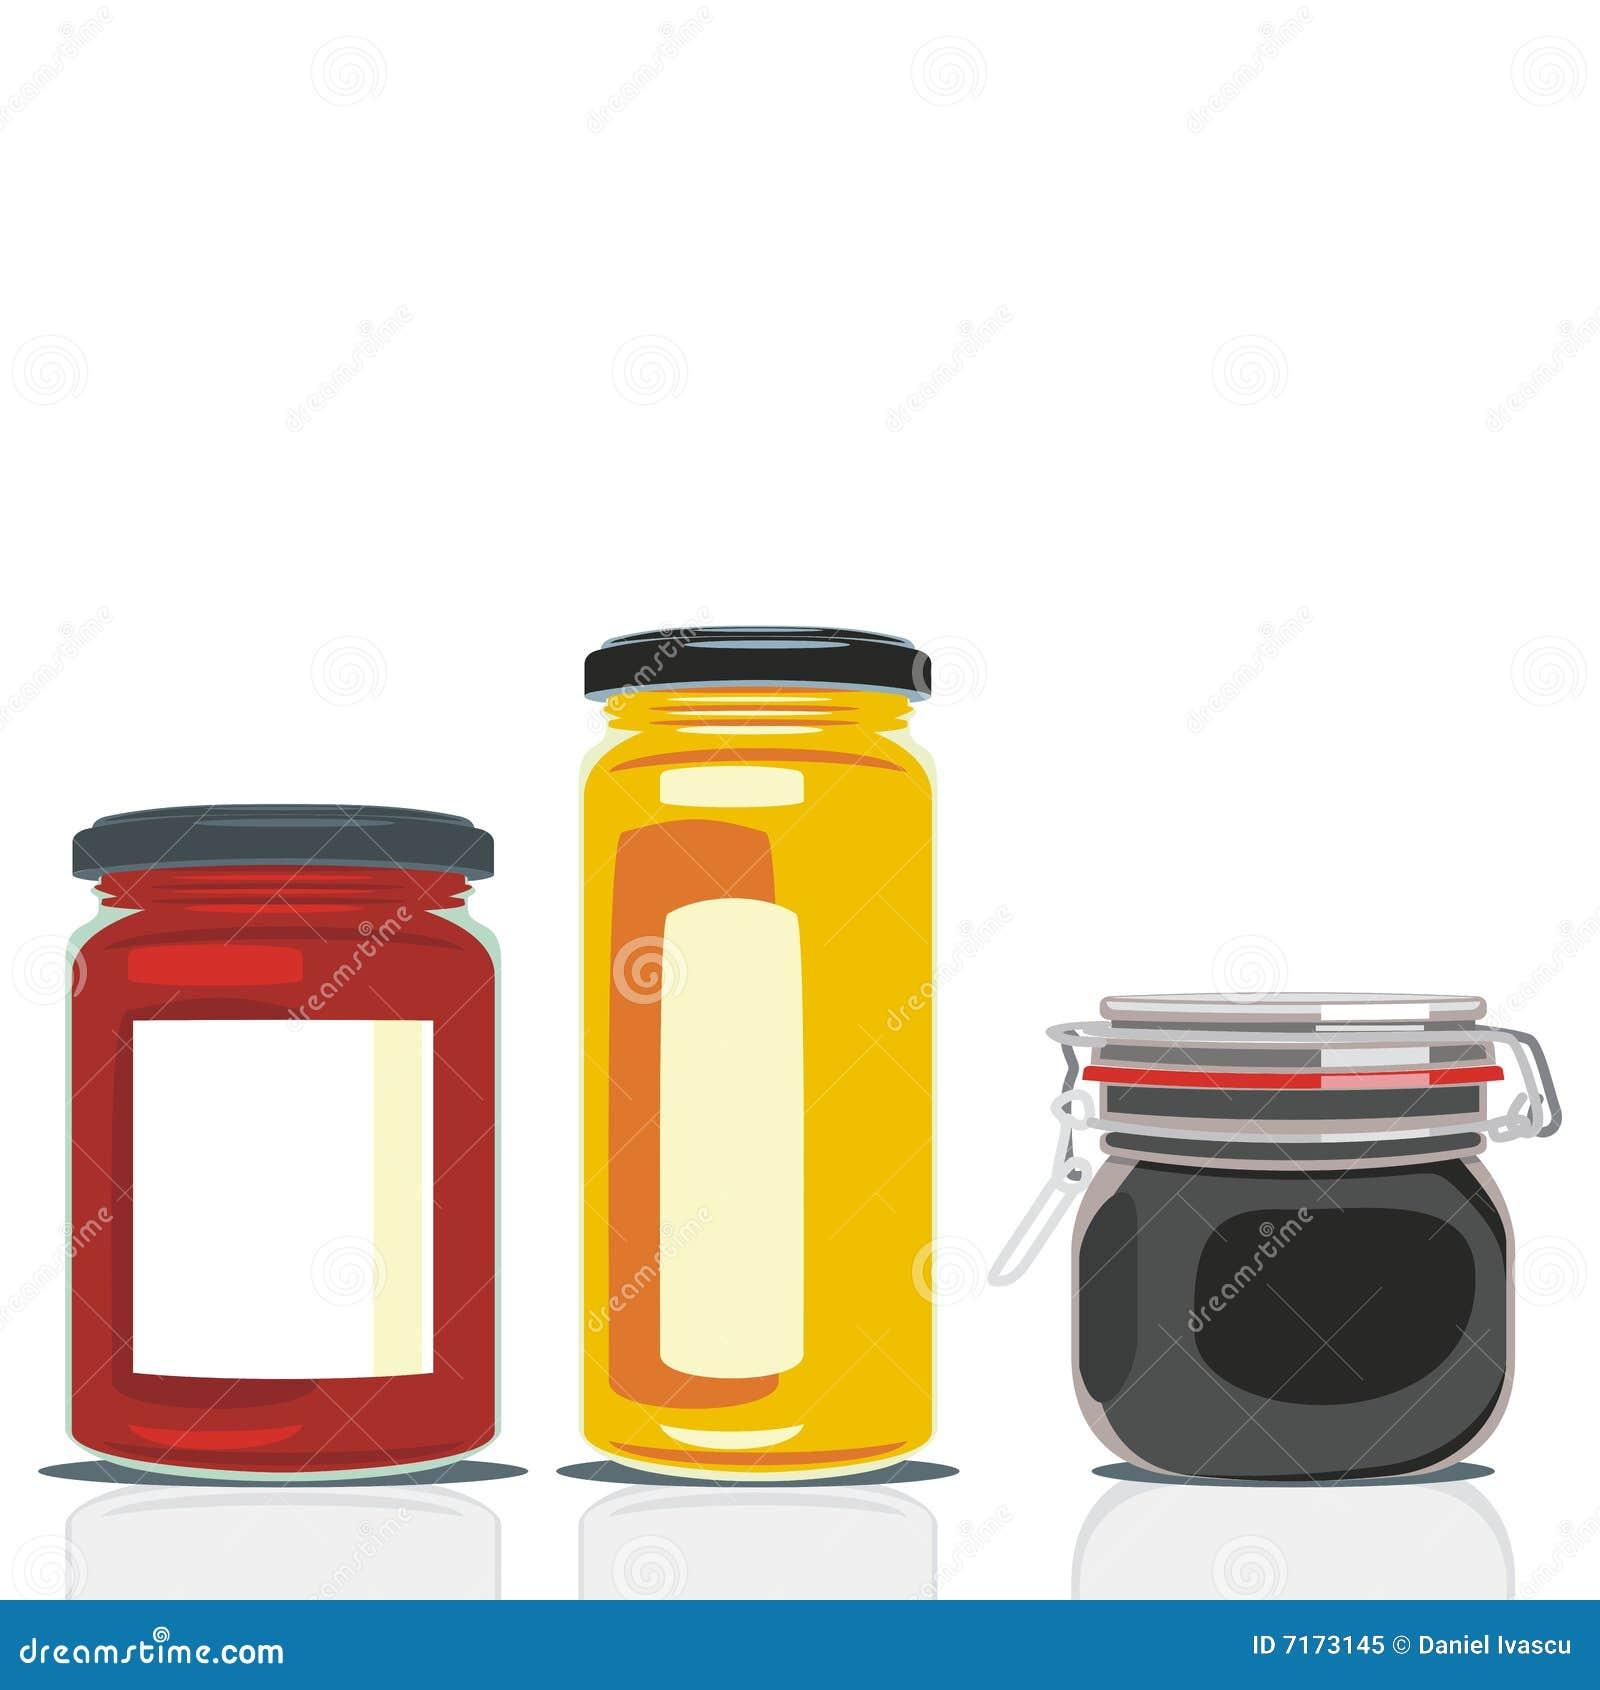 Preserving Jars Set Royalty Free Stock Photo Image 7173145 : preserving jars set 7173145 from dreamstime.com size 1300 x 1390 jpeg 309kB